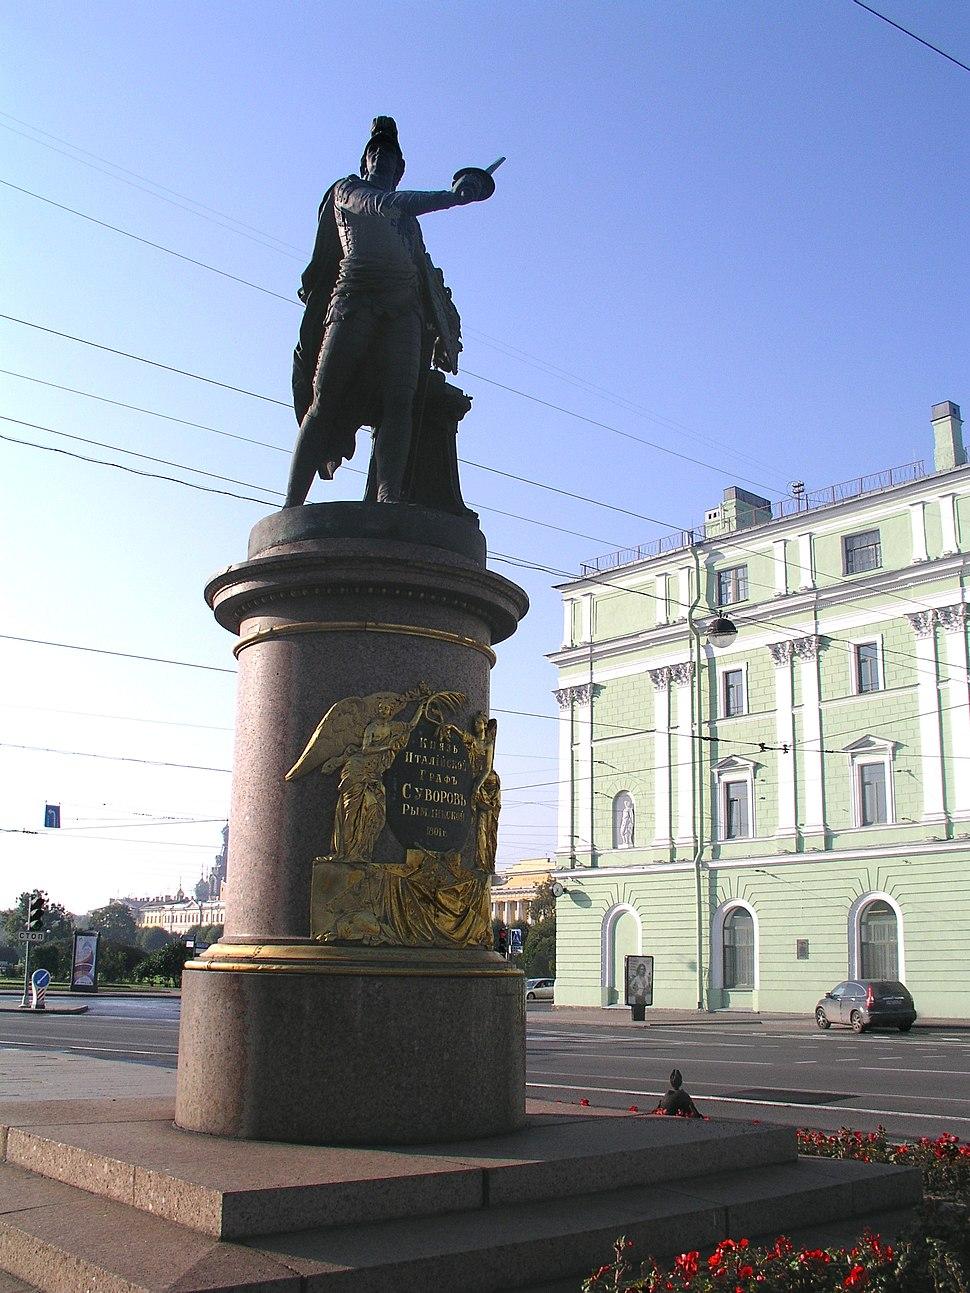 08-09-22 St. Petersburg Marsfeld Suworow-Denkmal